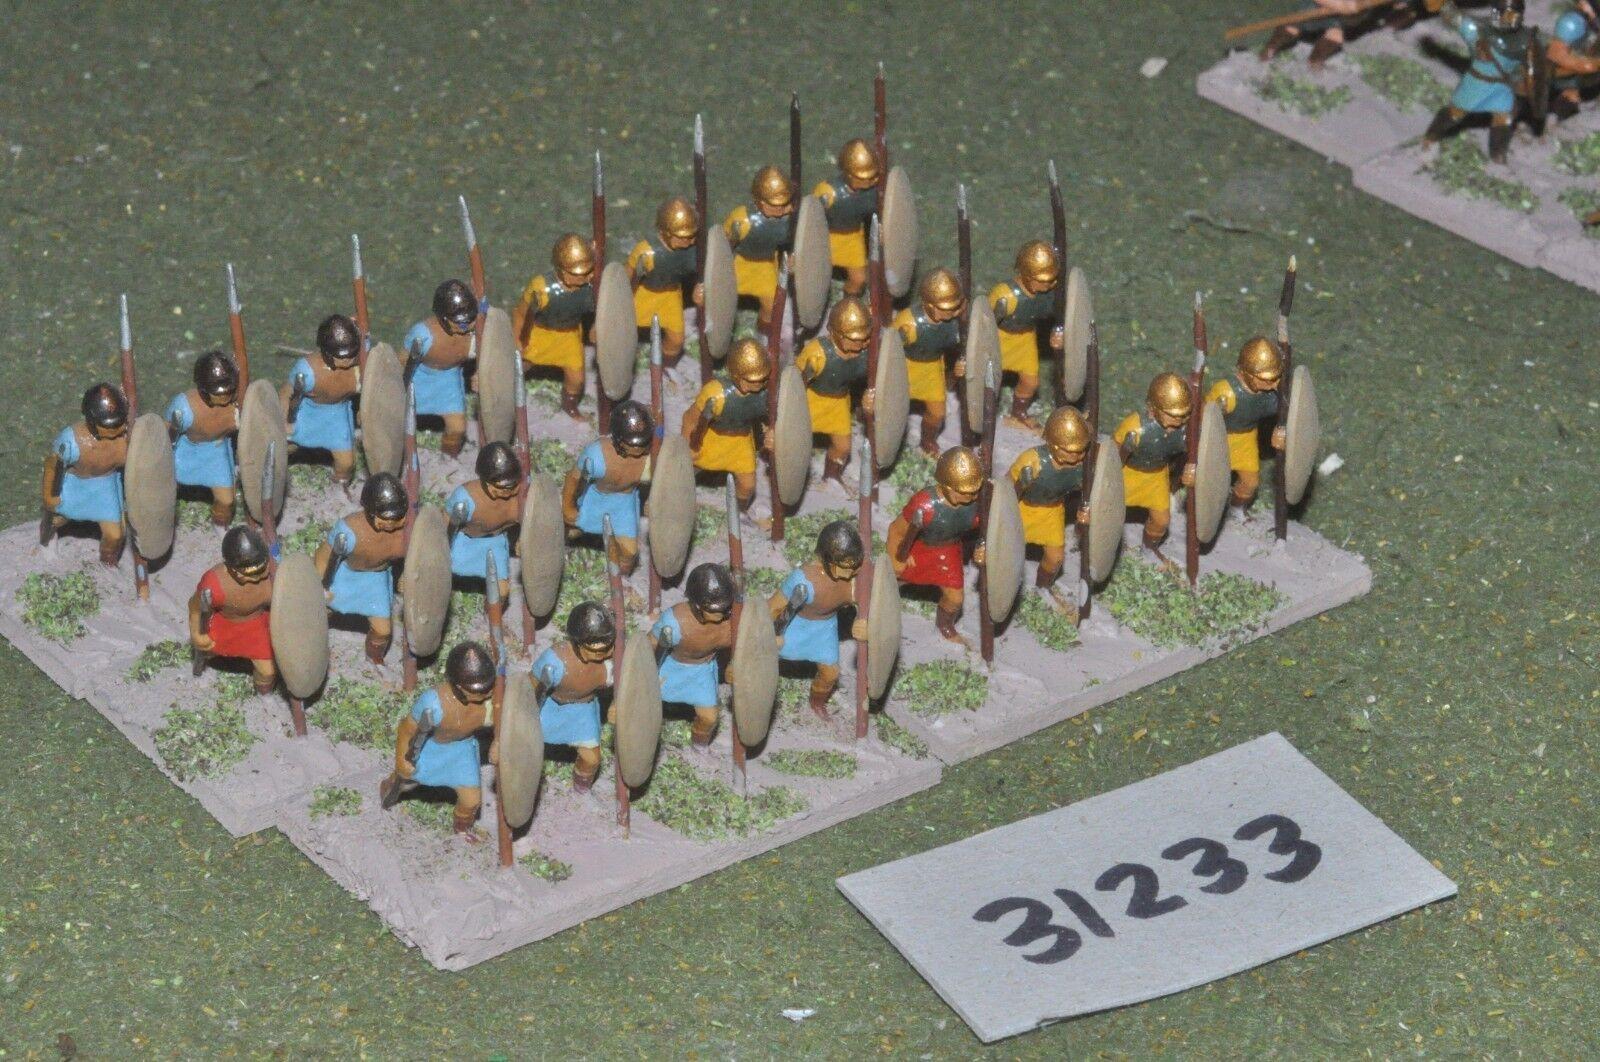 25mm griego clásico-javelinmen 24 figuras-INF (31233)